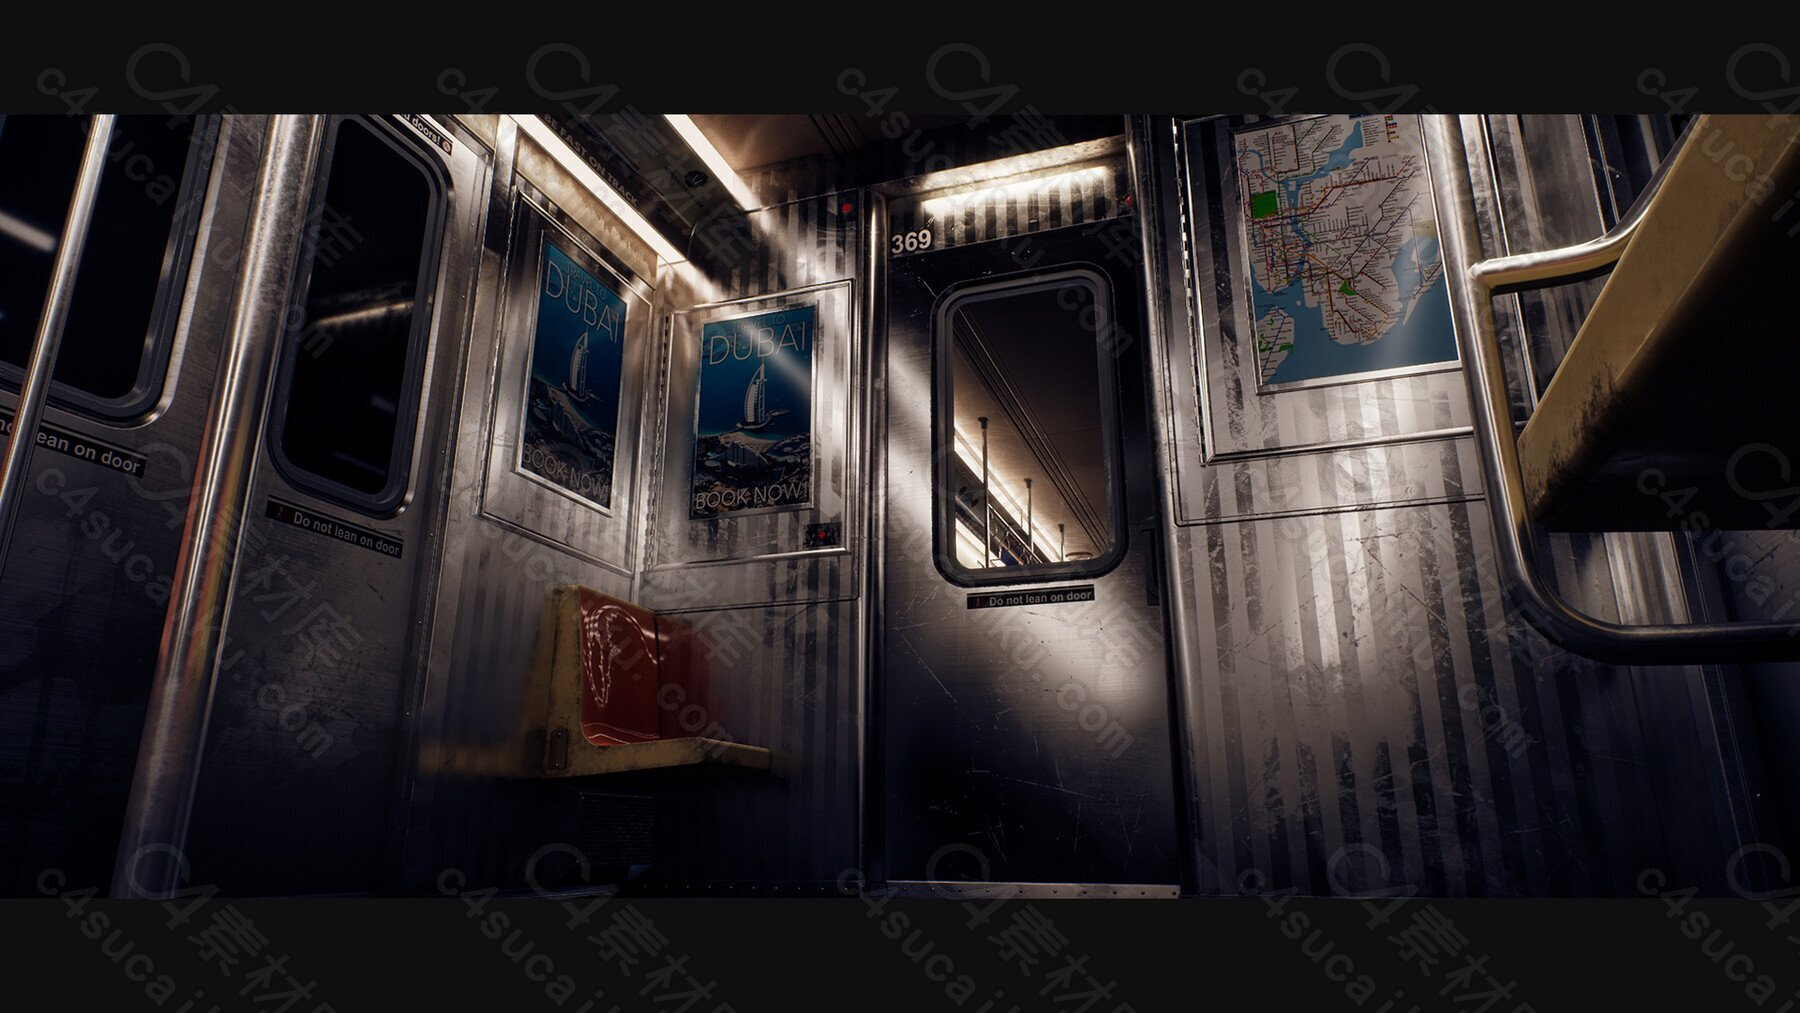 C4素材网-UE5教程-地铁车厢内部创建教程(中英双语机翻字幕)-含项目文件